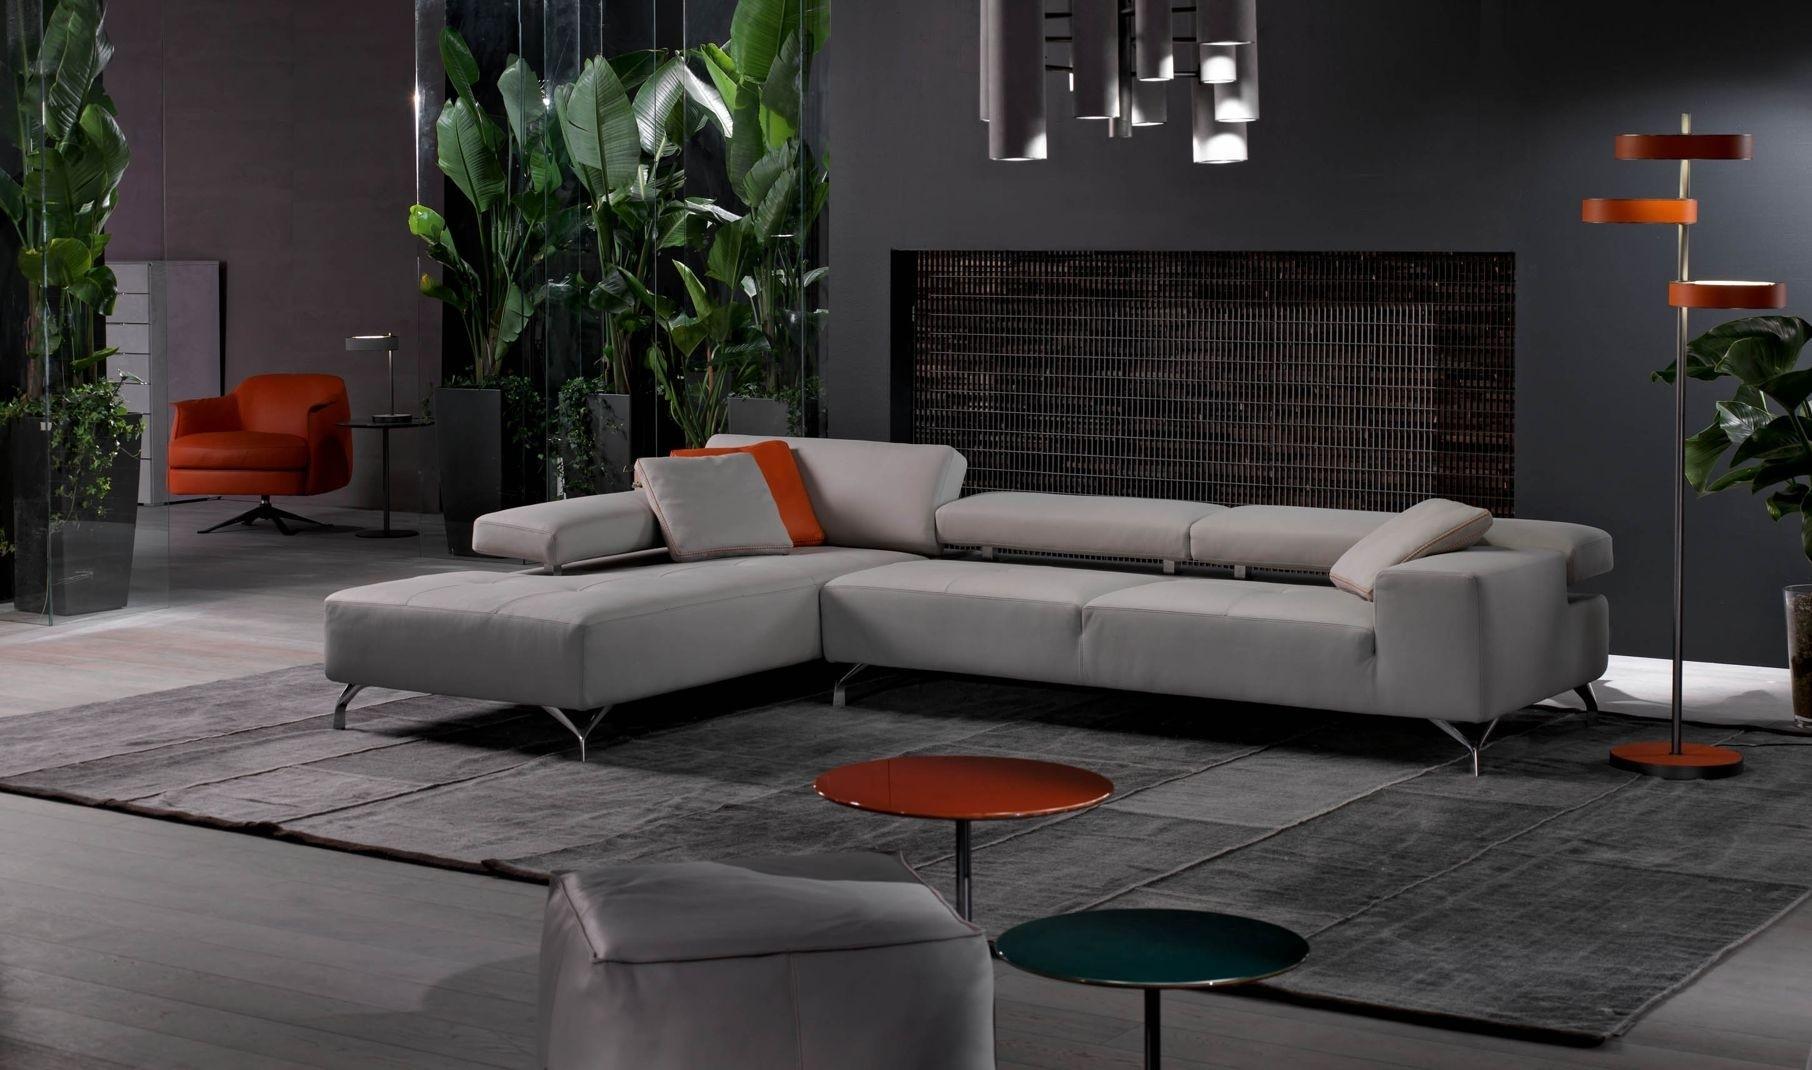 Miami Modern Sectional Sofa | Cierre Imbottiti For Miami Sectional Sofas (Image 4 of 10)